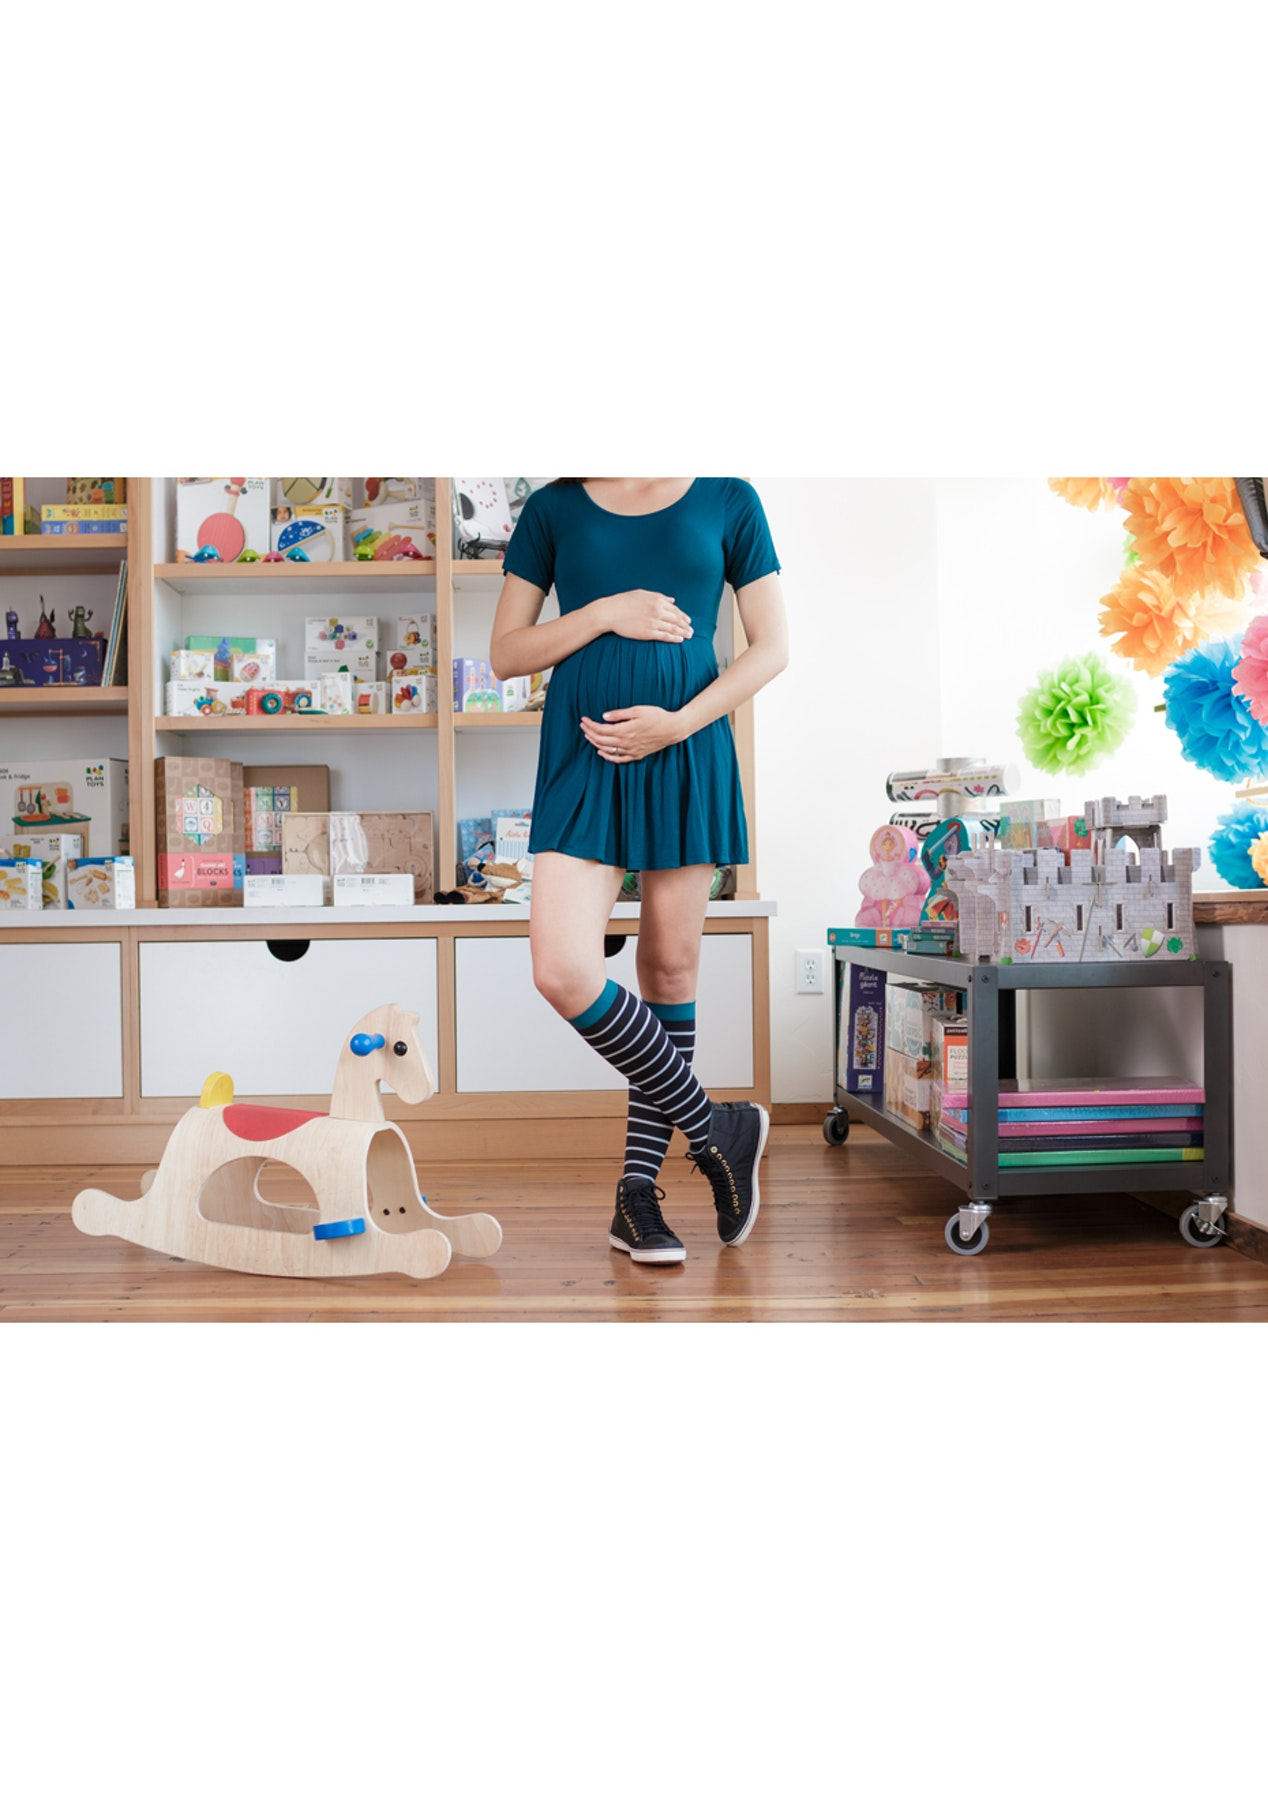 0863f50990 Vim & Vigr Fashion Compression Socks - Stylish Gifts for Her - Onceit